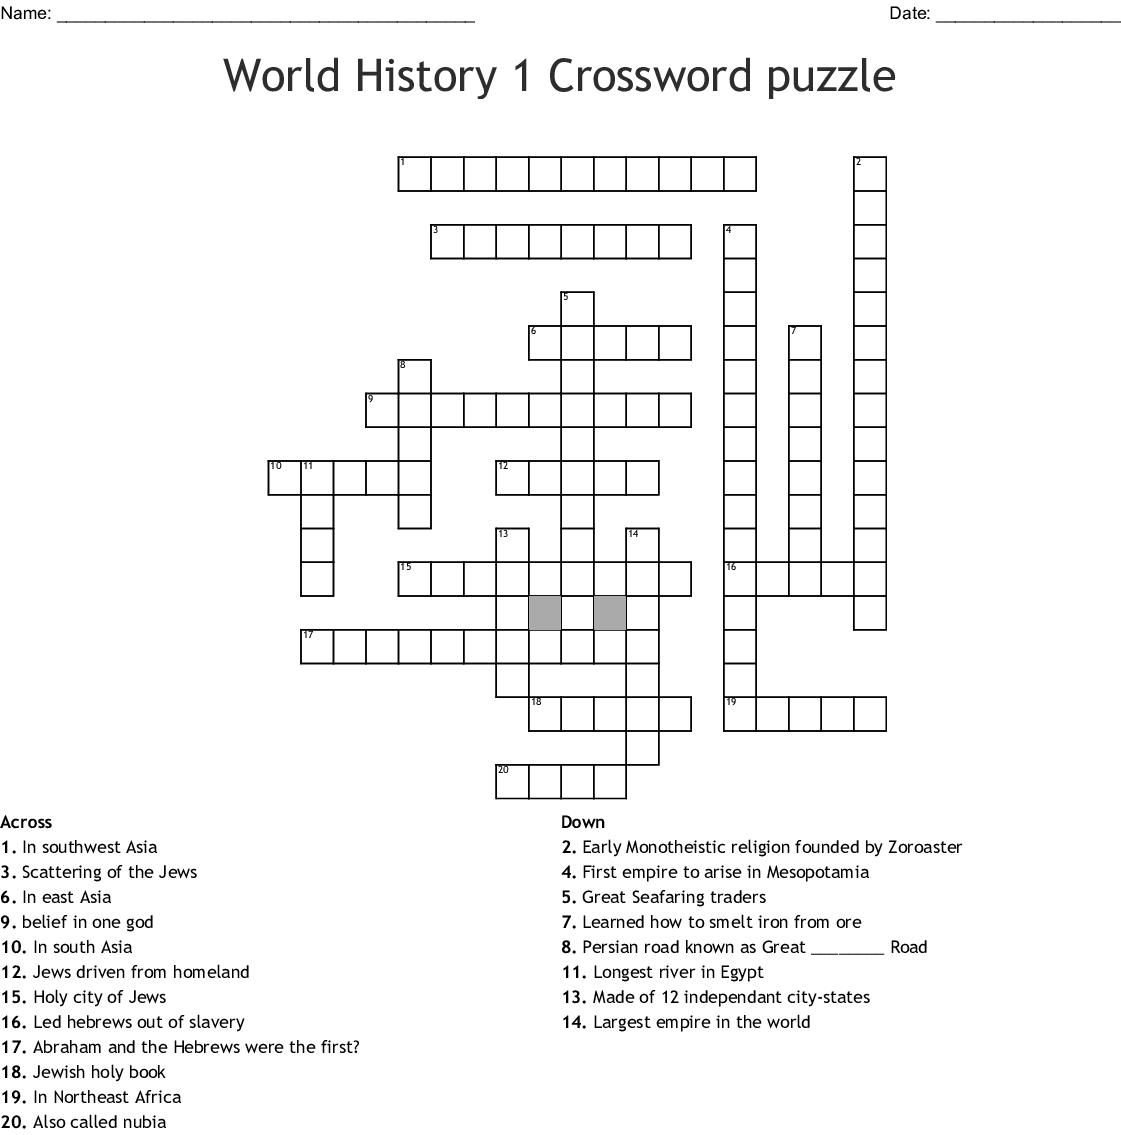 World History 1 Crossword Puzzle - Wordmint